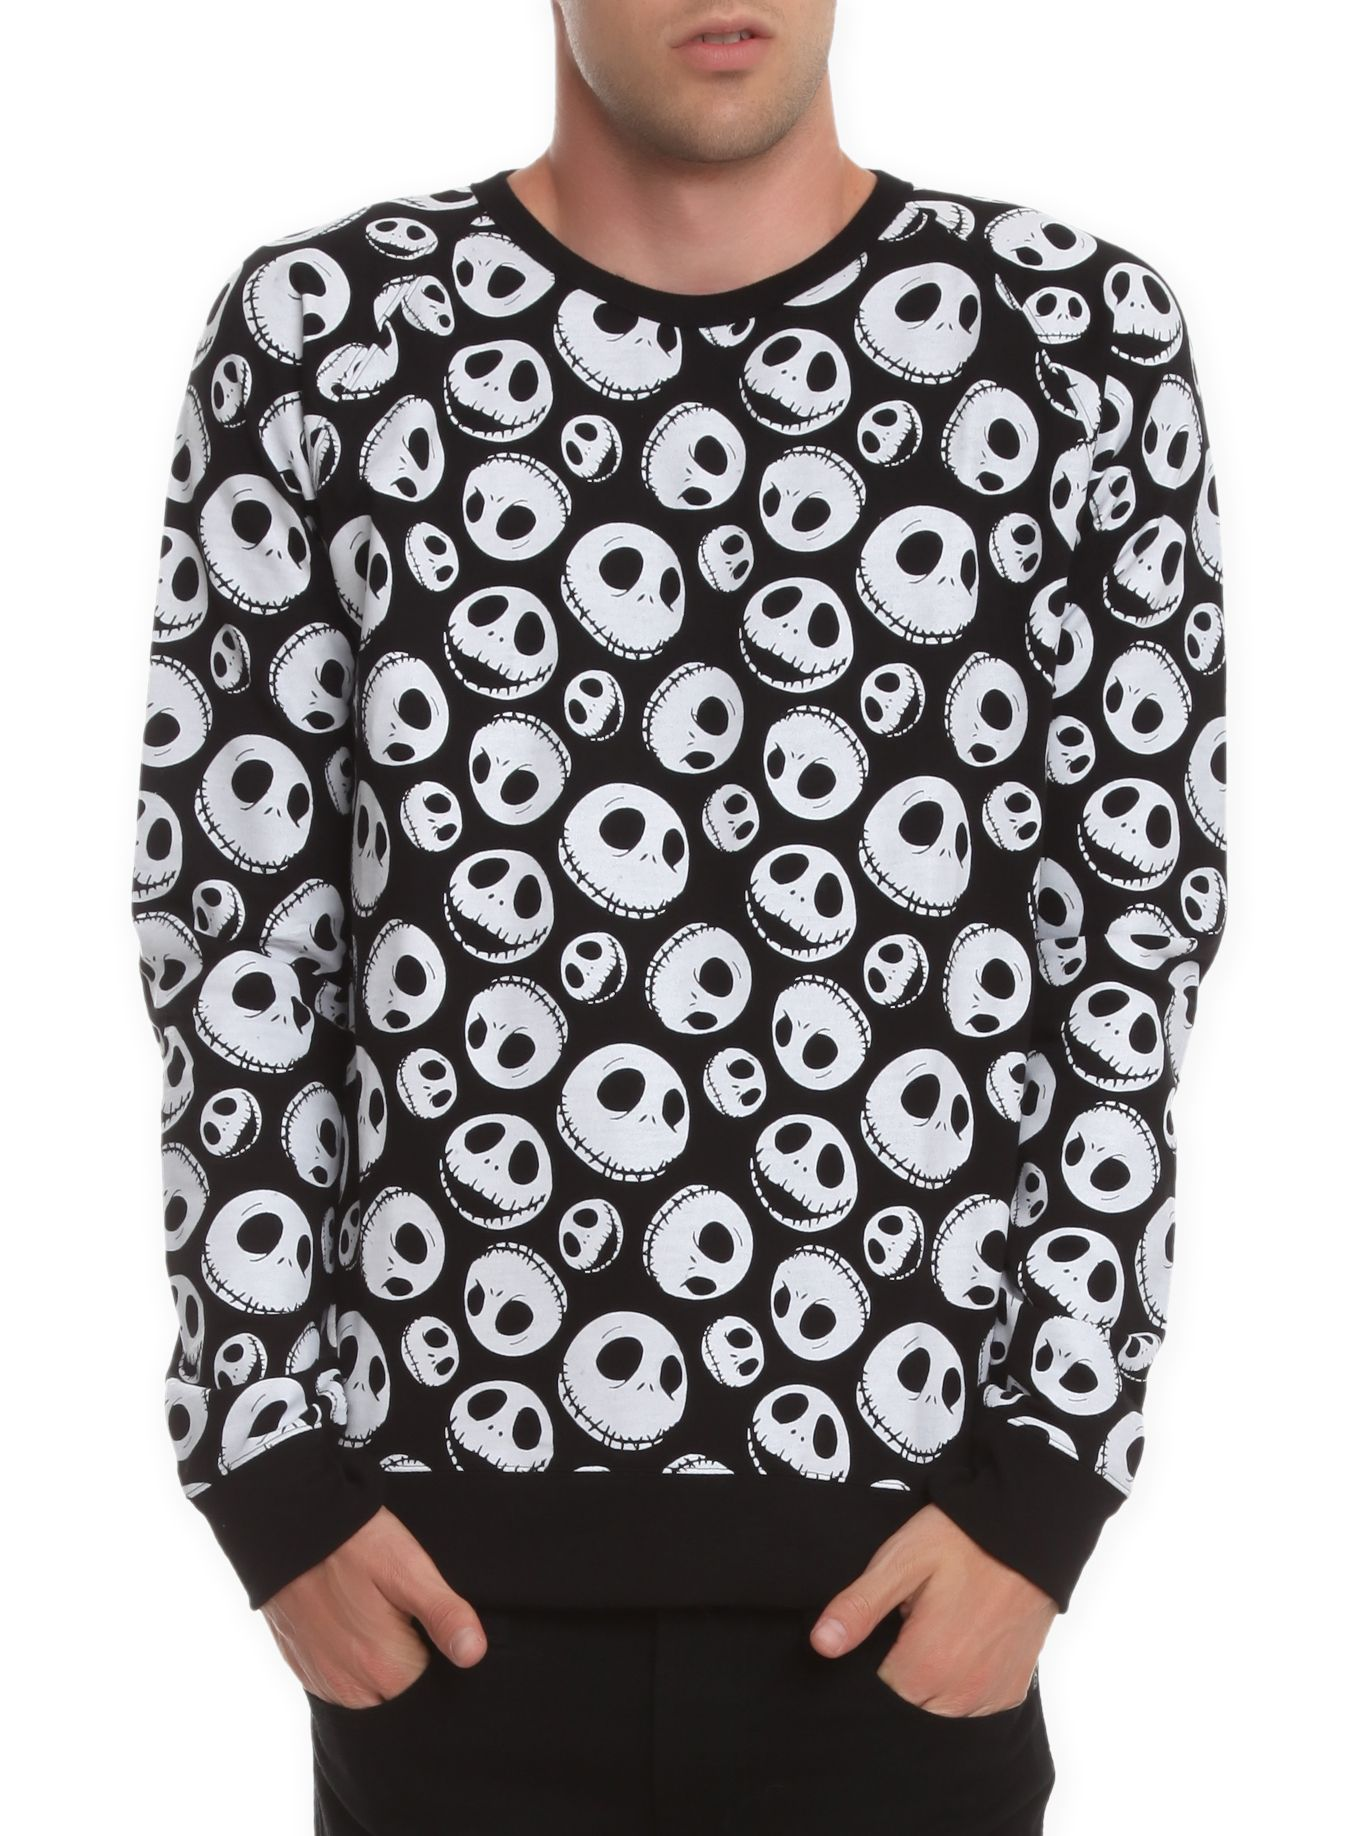 The Nightmare Before Christmas Jack Skellington Sweatshirt | Hot ...